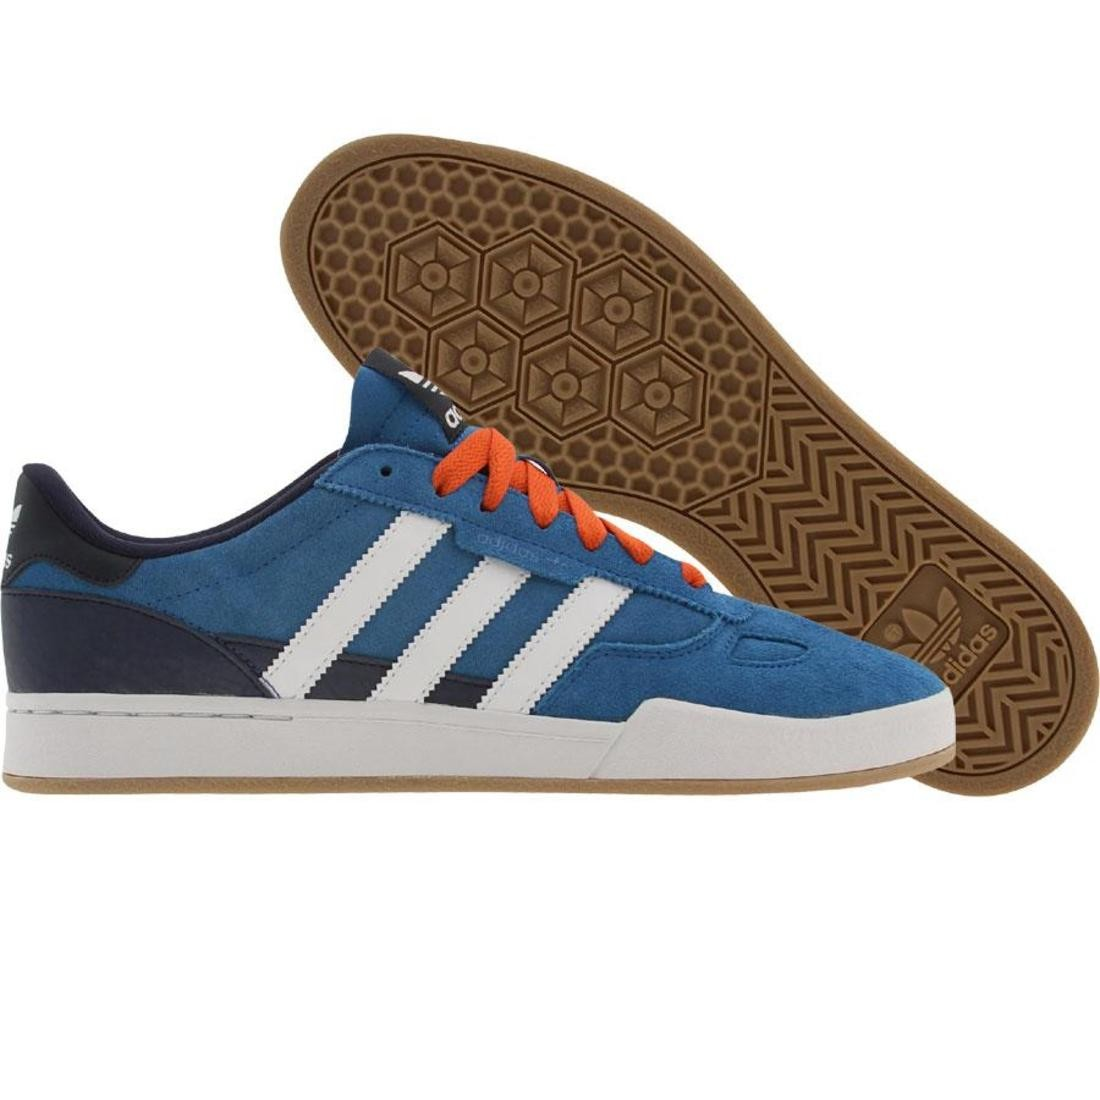 Adidas Skate Ciero Update (bluebird / runninwhite / college navy)